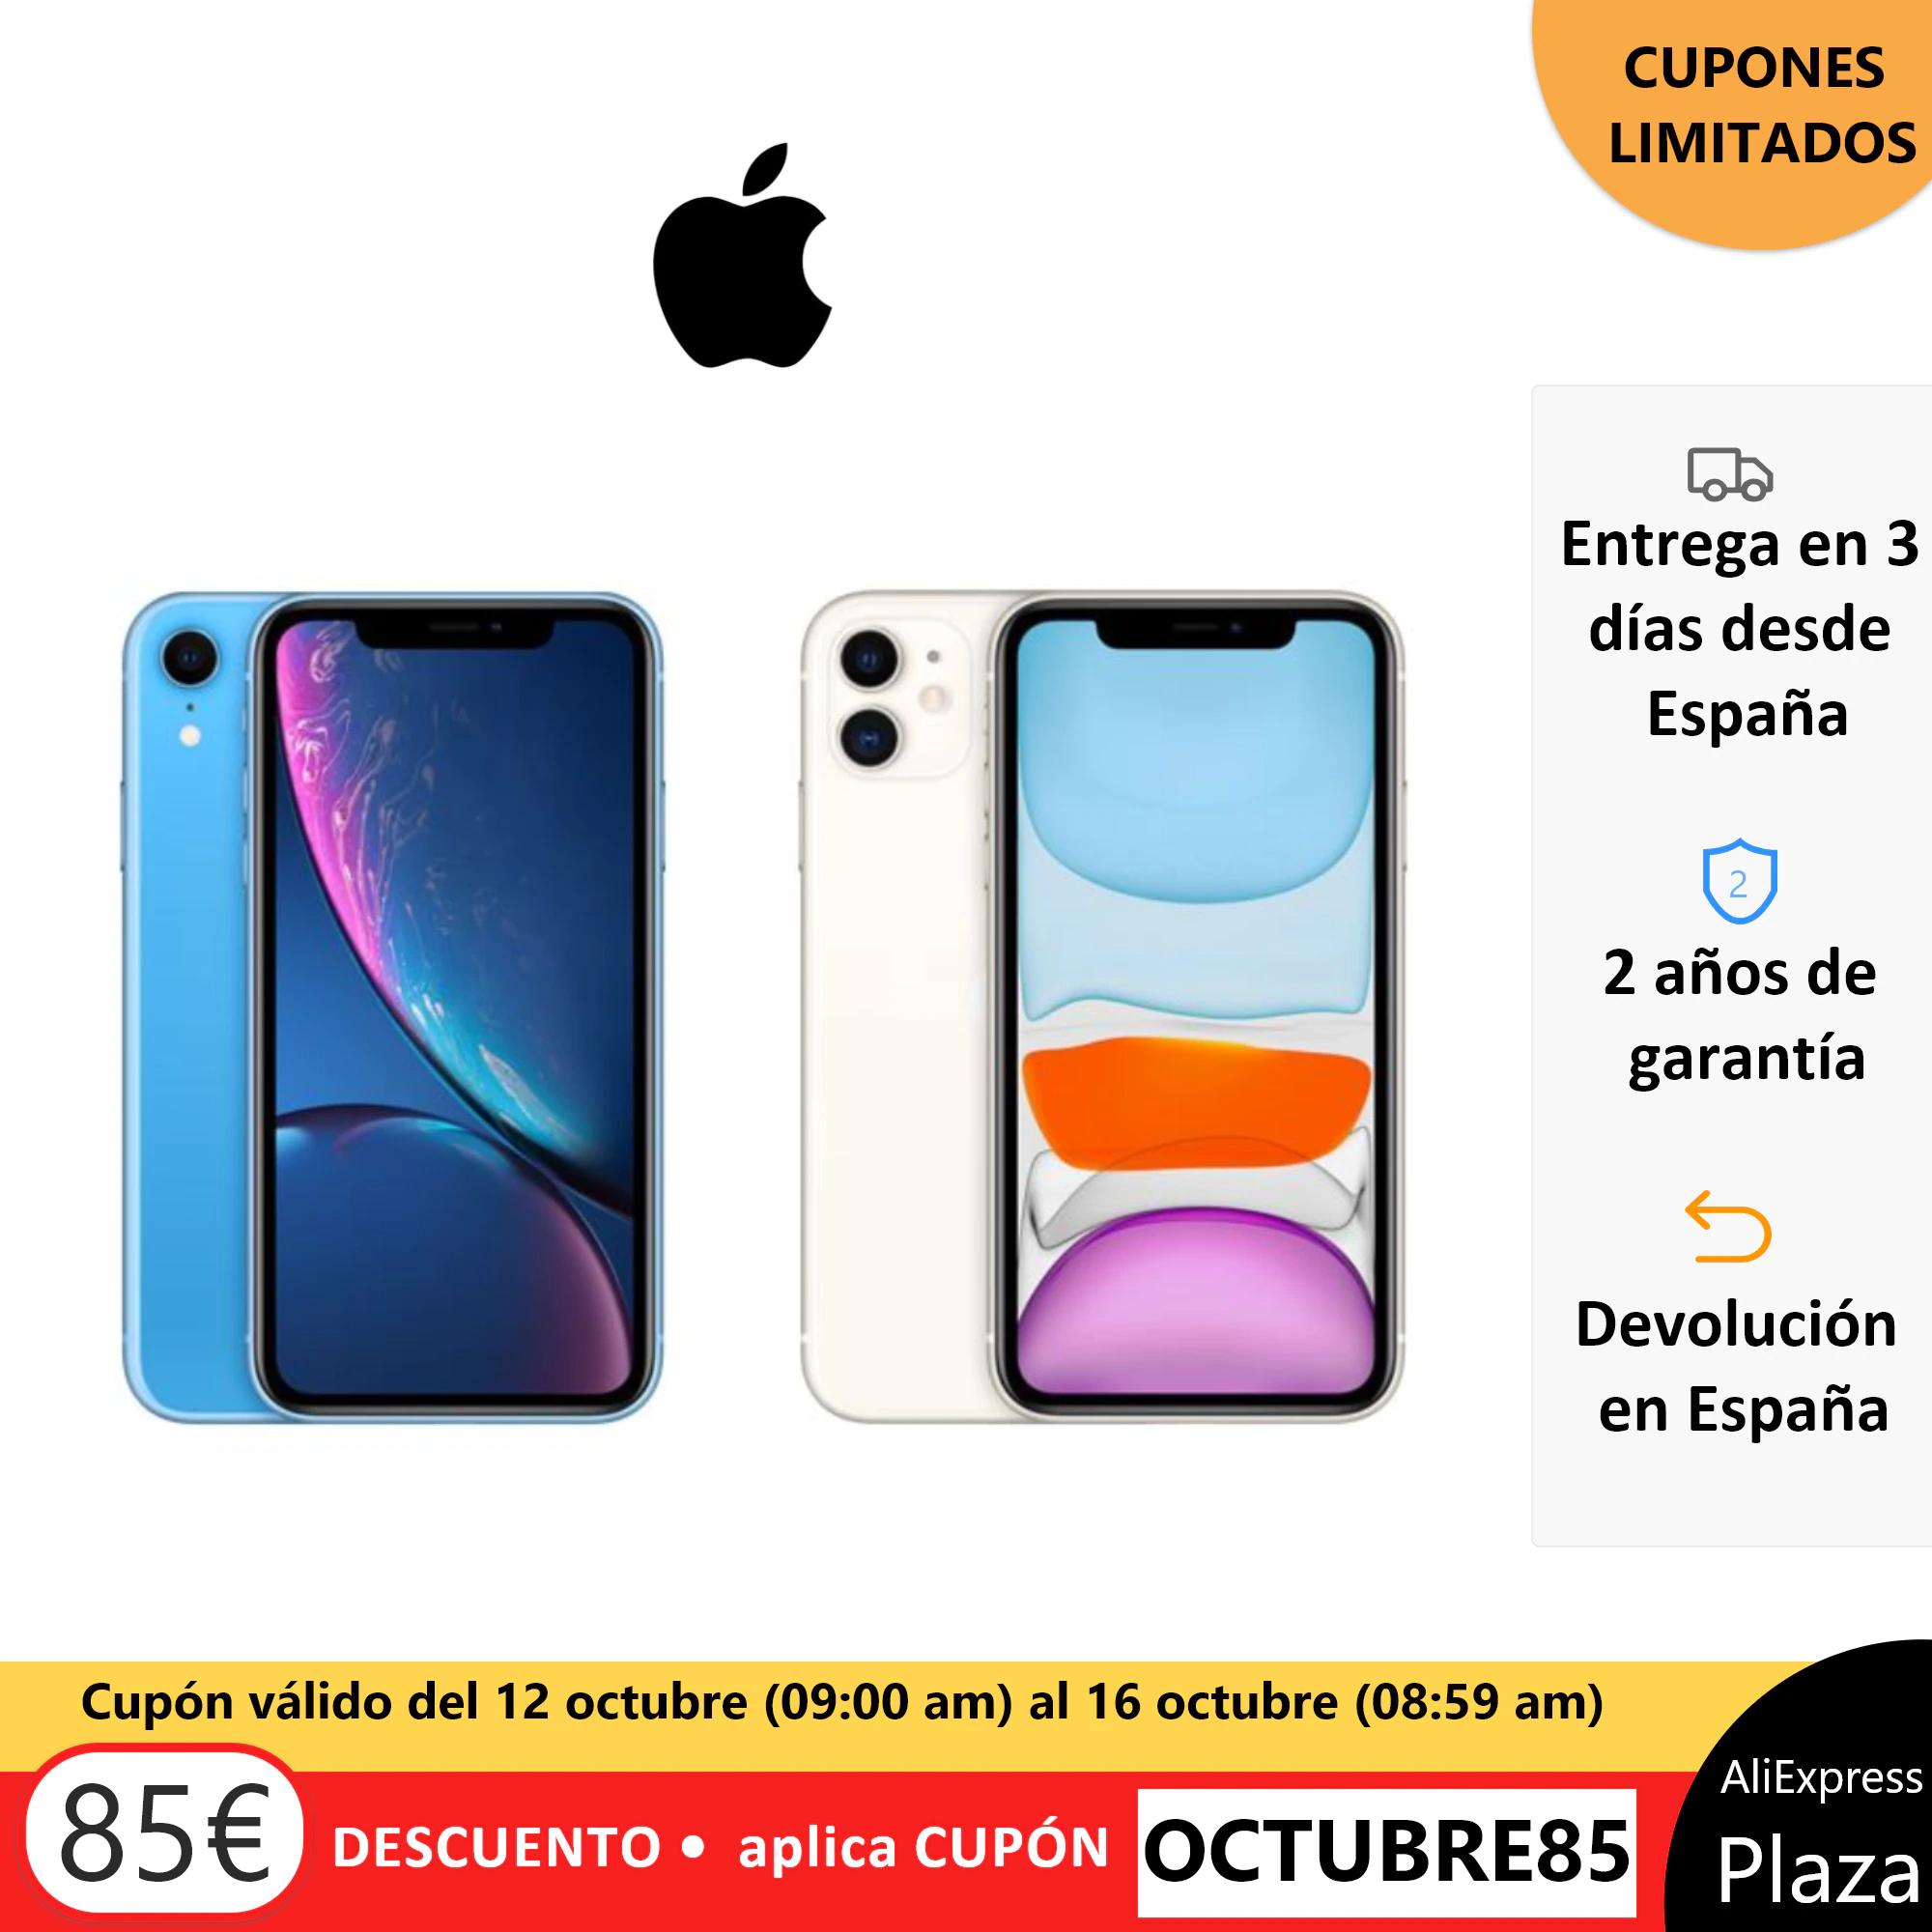 Apple iPhone XR 64 ALIEXPRESS PLAZA